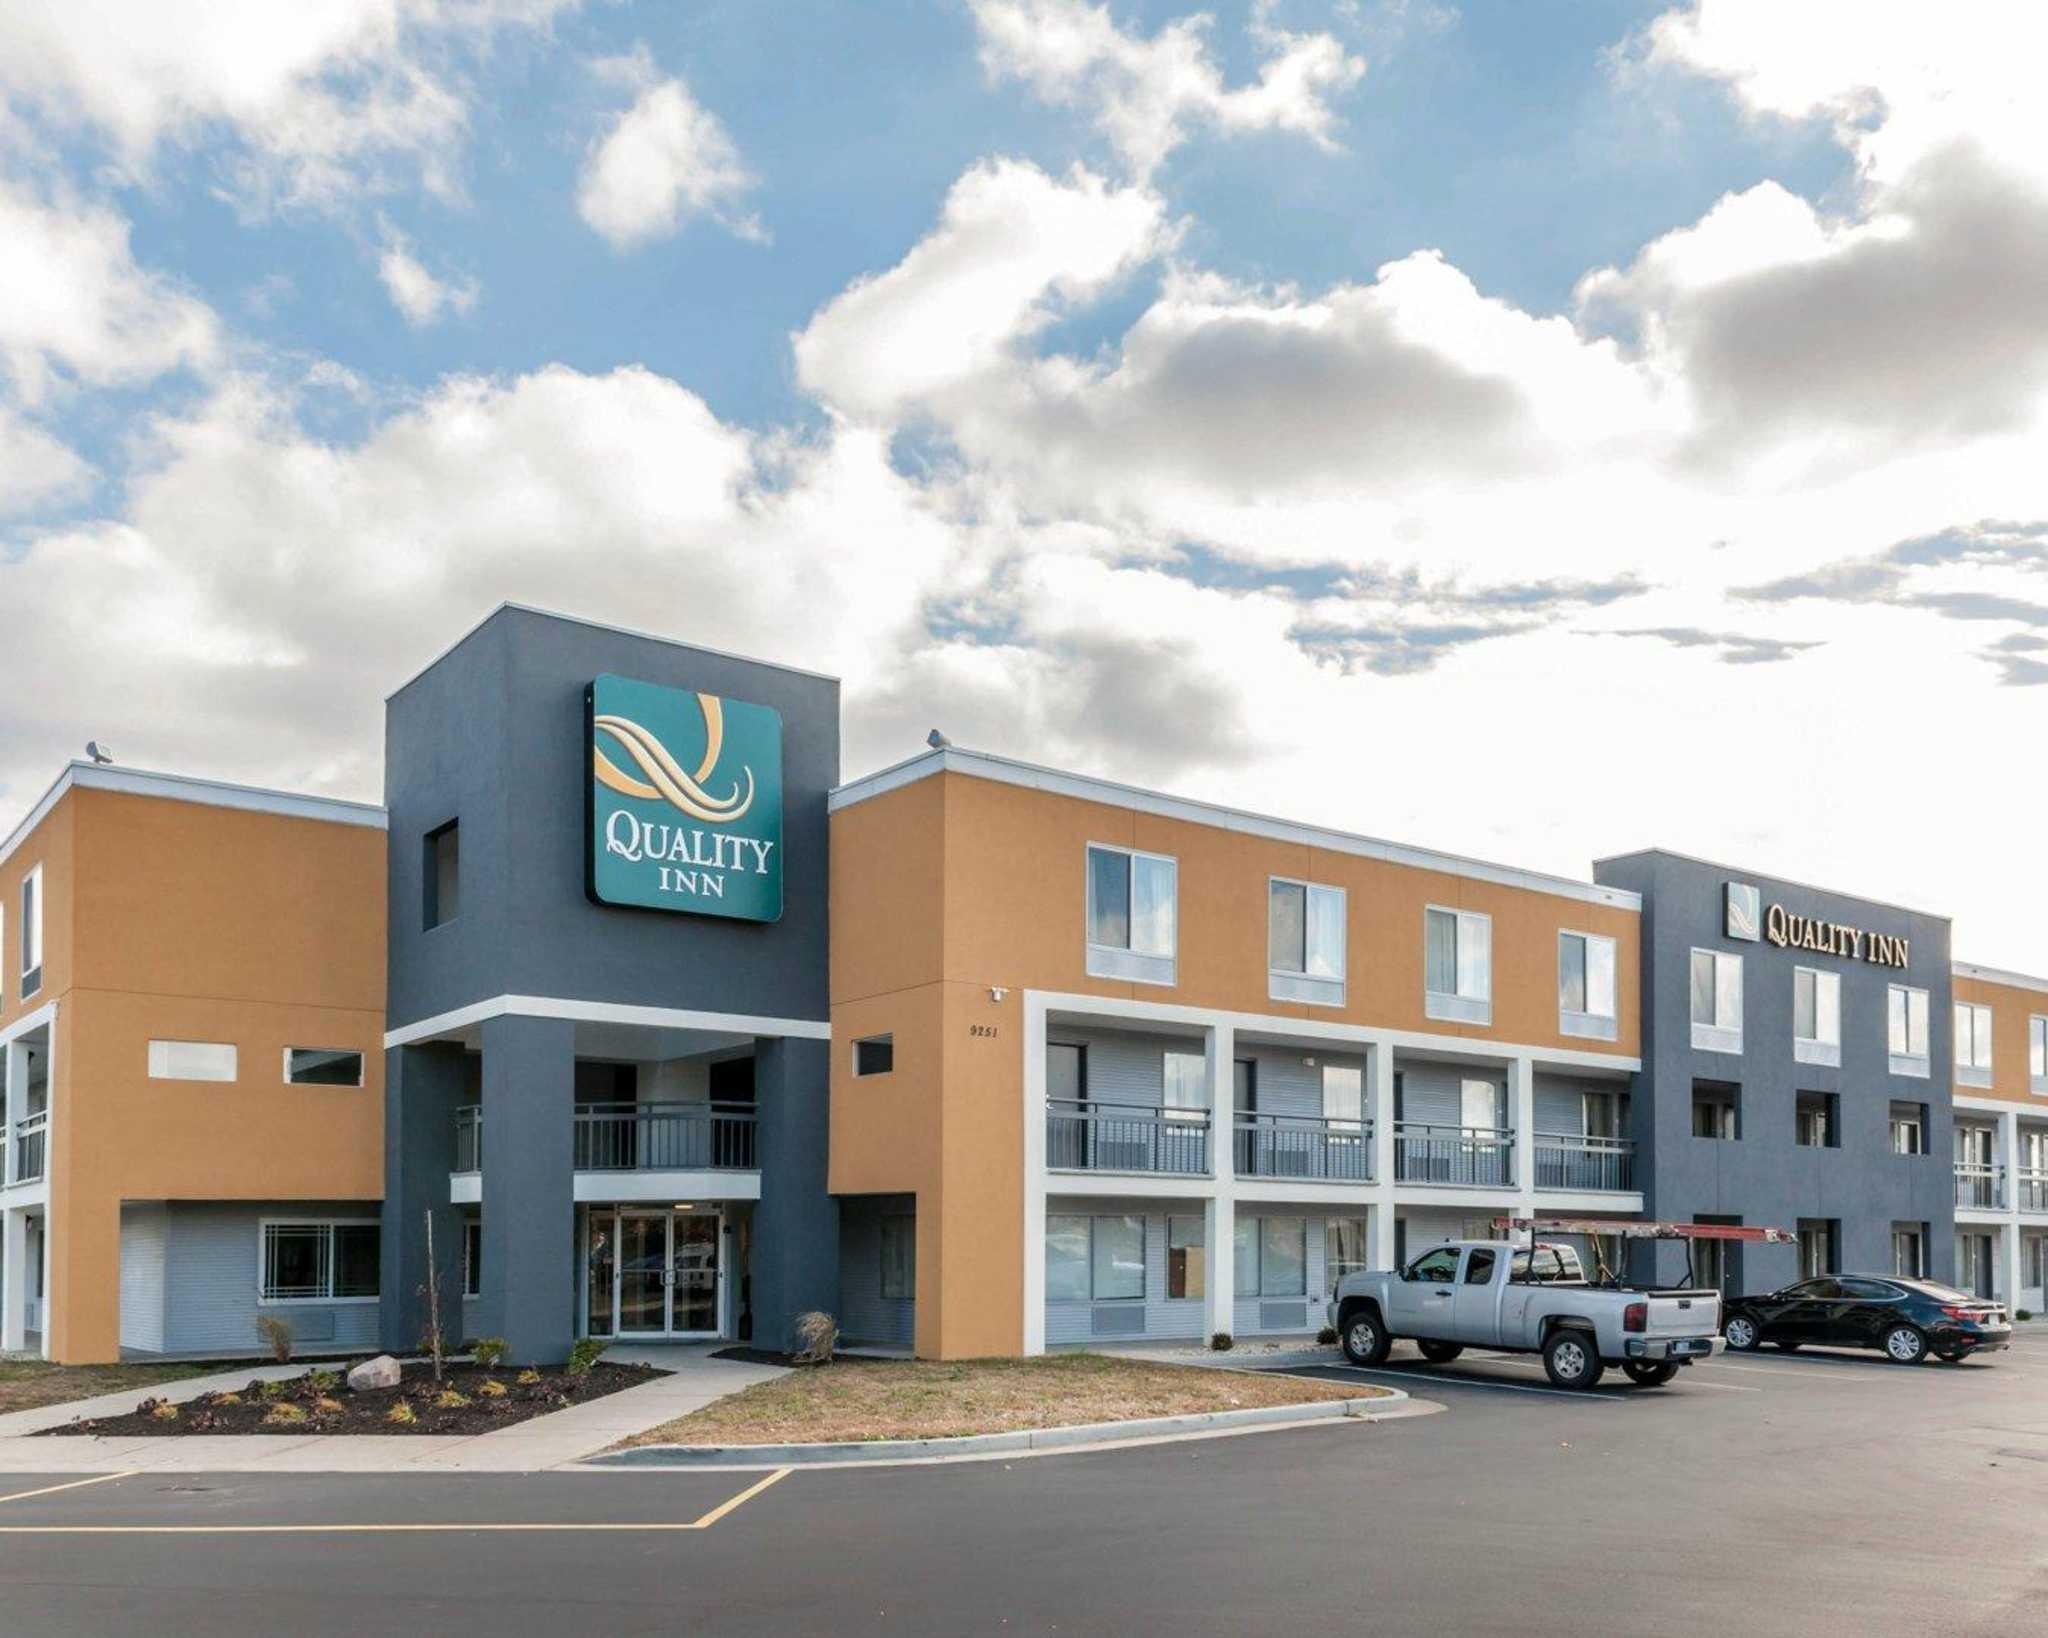 Quality Inn Northwest image 1